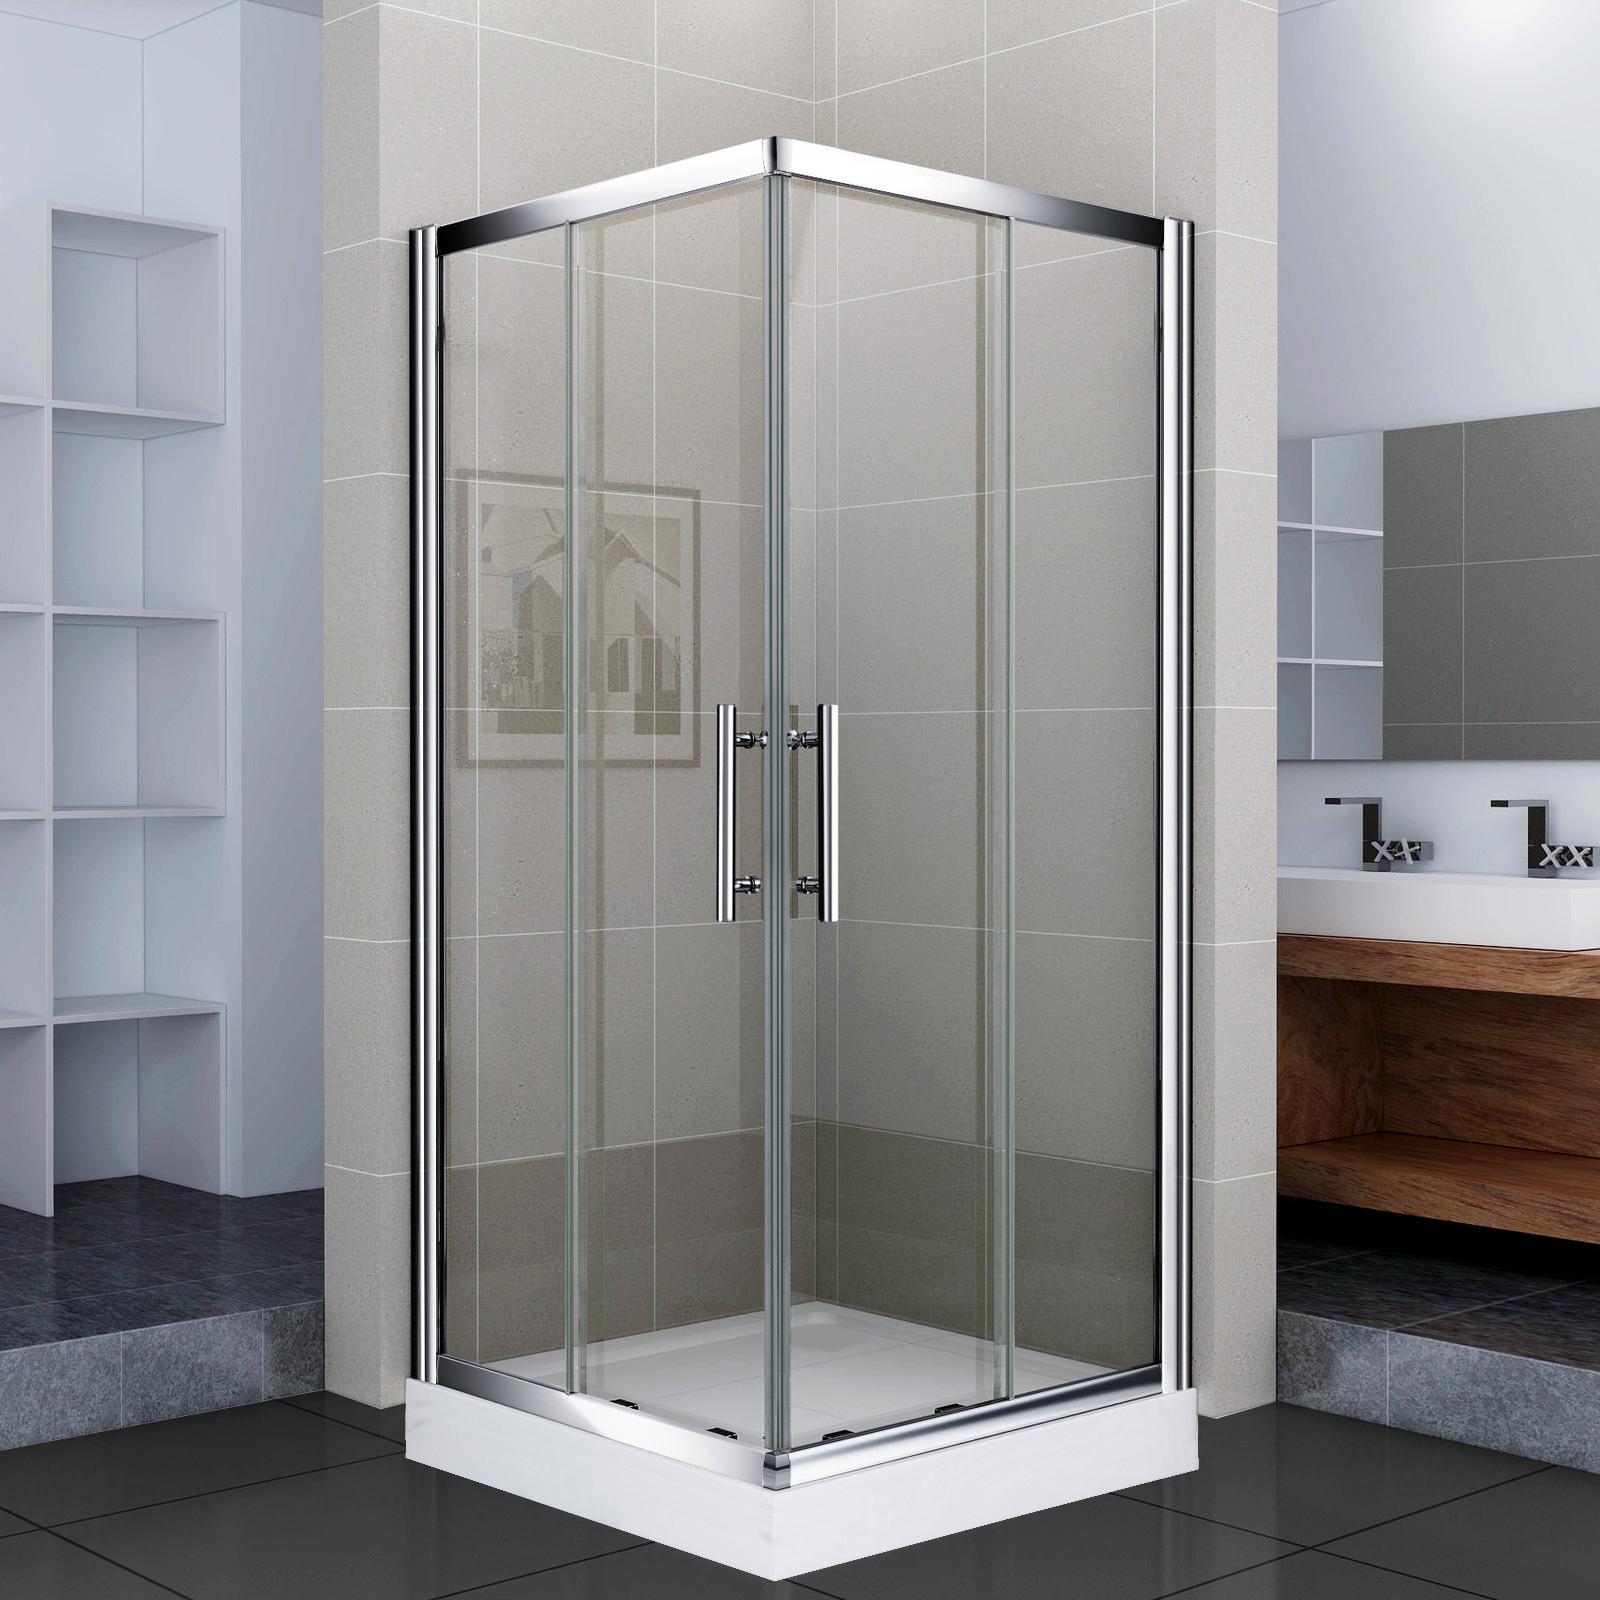 80x80x195 duschkabine komplett duschabtrennung dusche duschwand eckdusche ebay. Black Bedroom Furniture Sets. Home Design Ideas